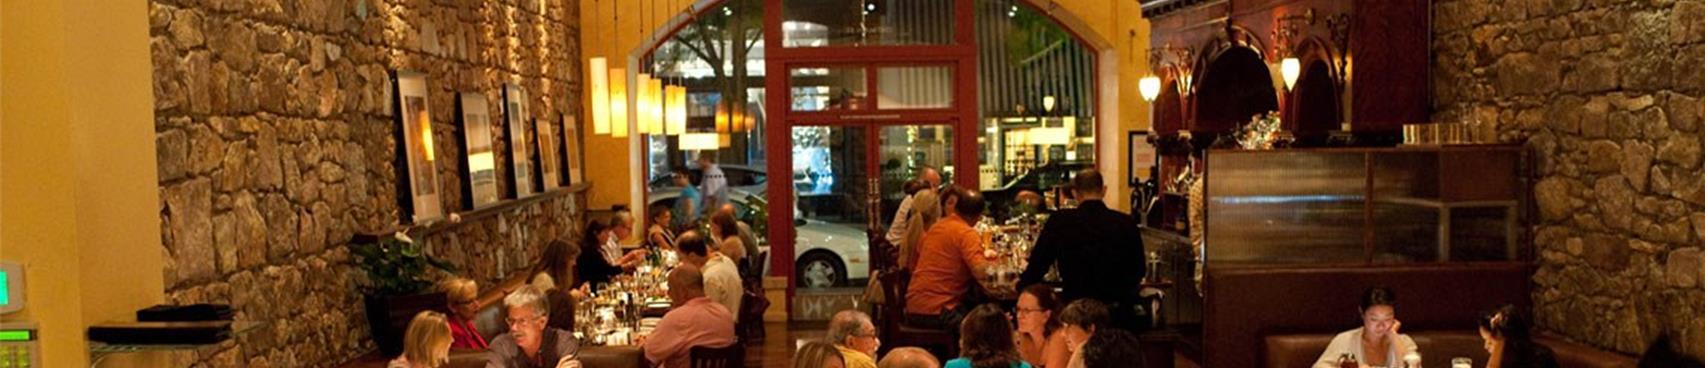 Market Restaurant- St. Helena